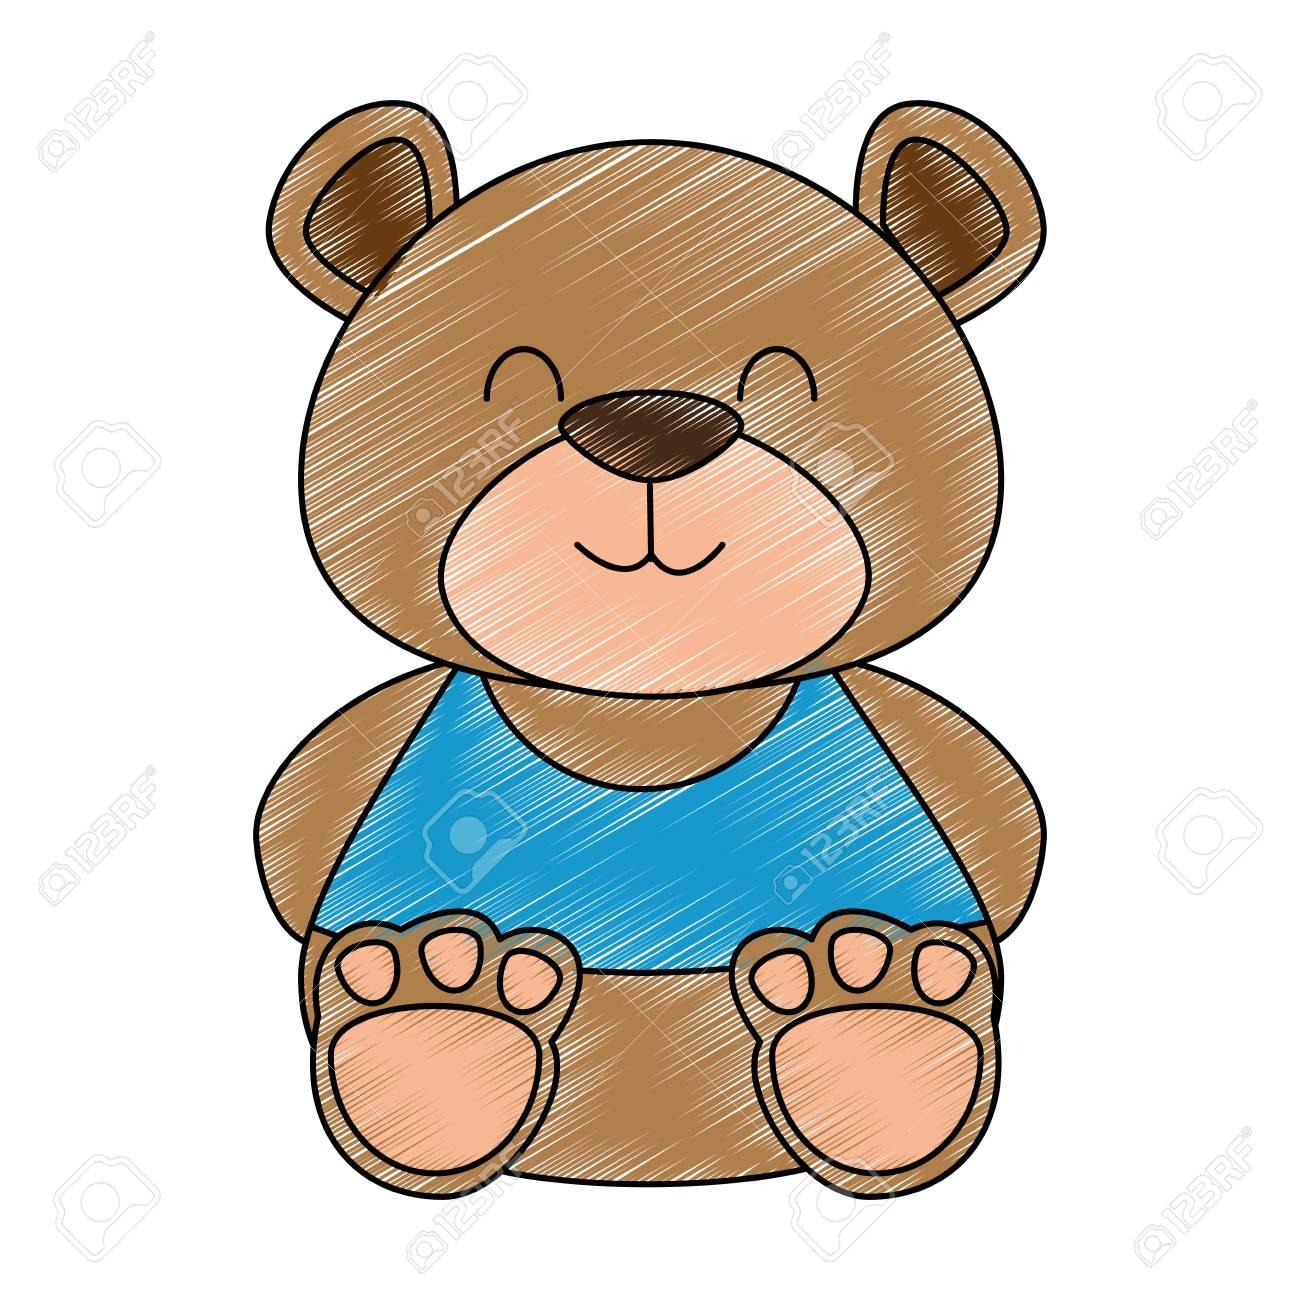 Cute Teddy Bear Icon Vector Illustration Design Royalty Free